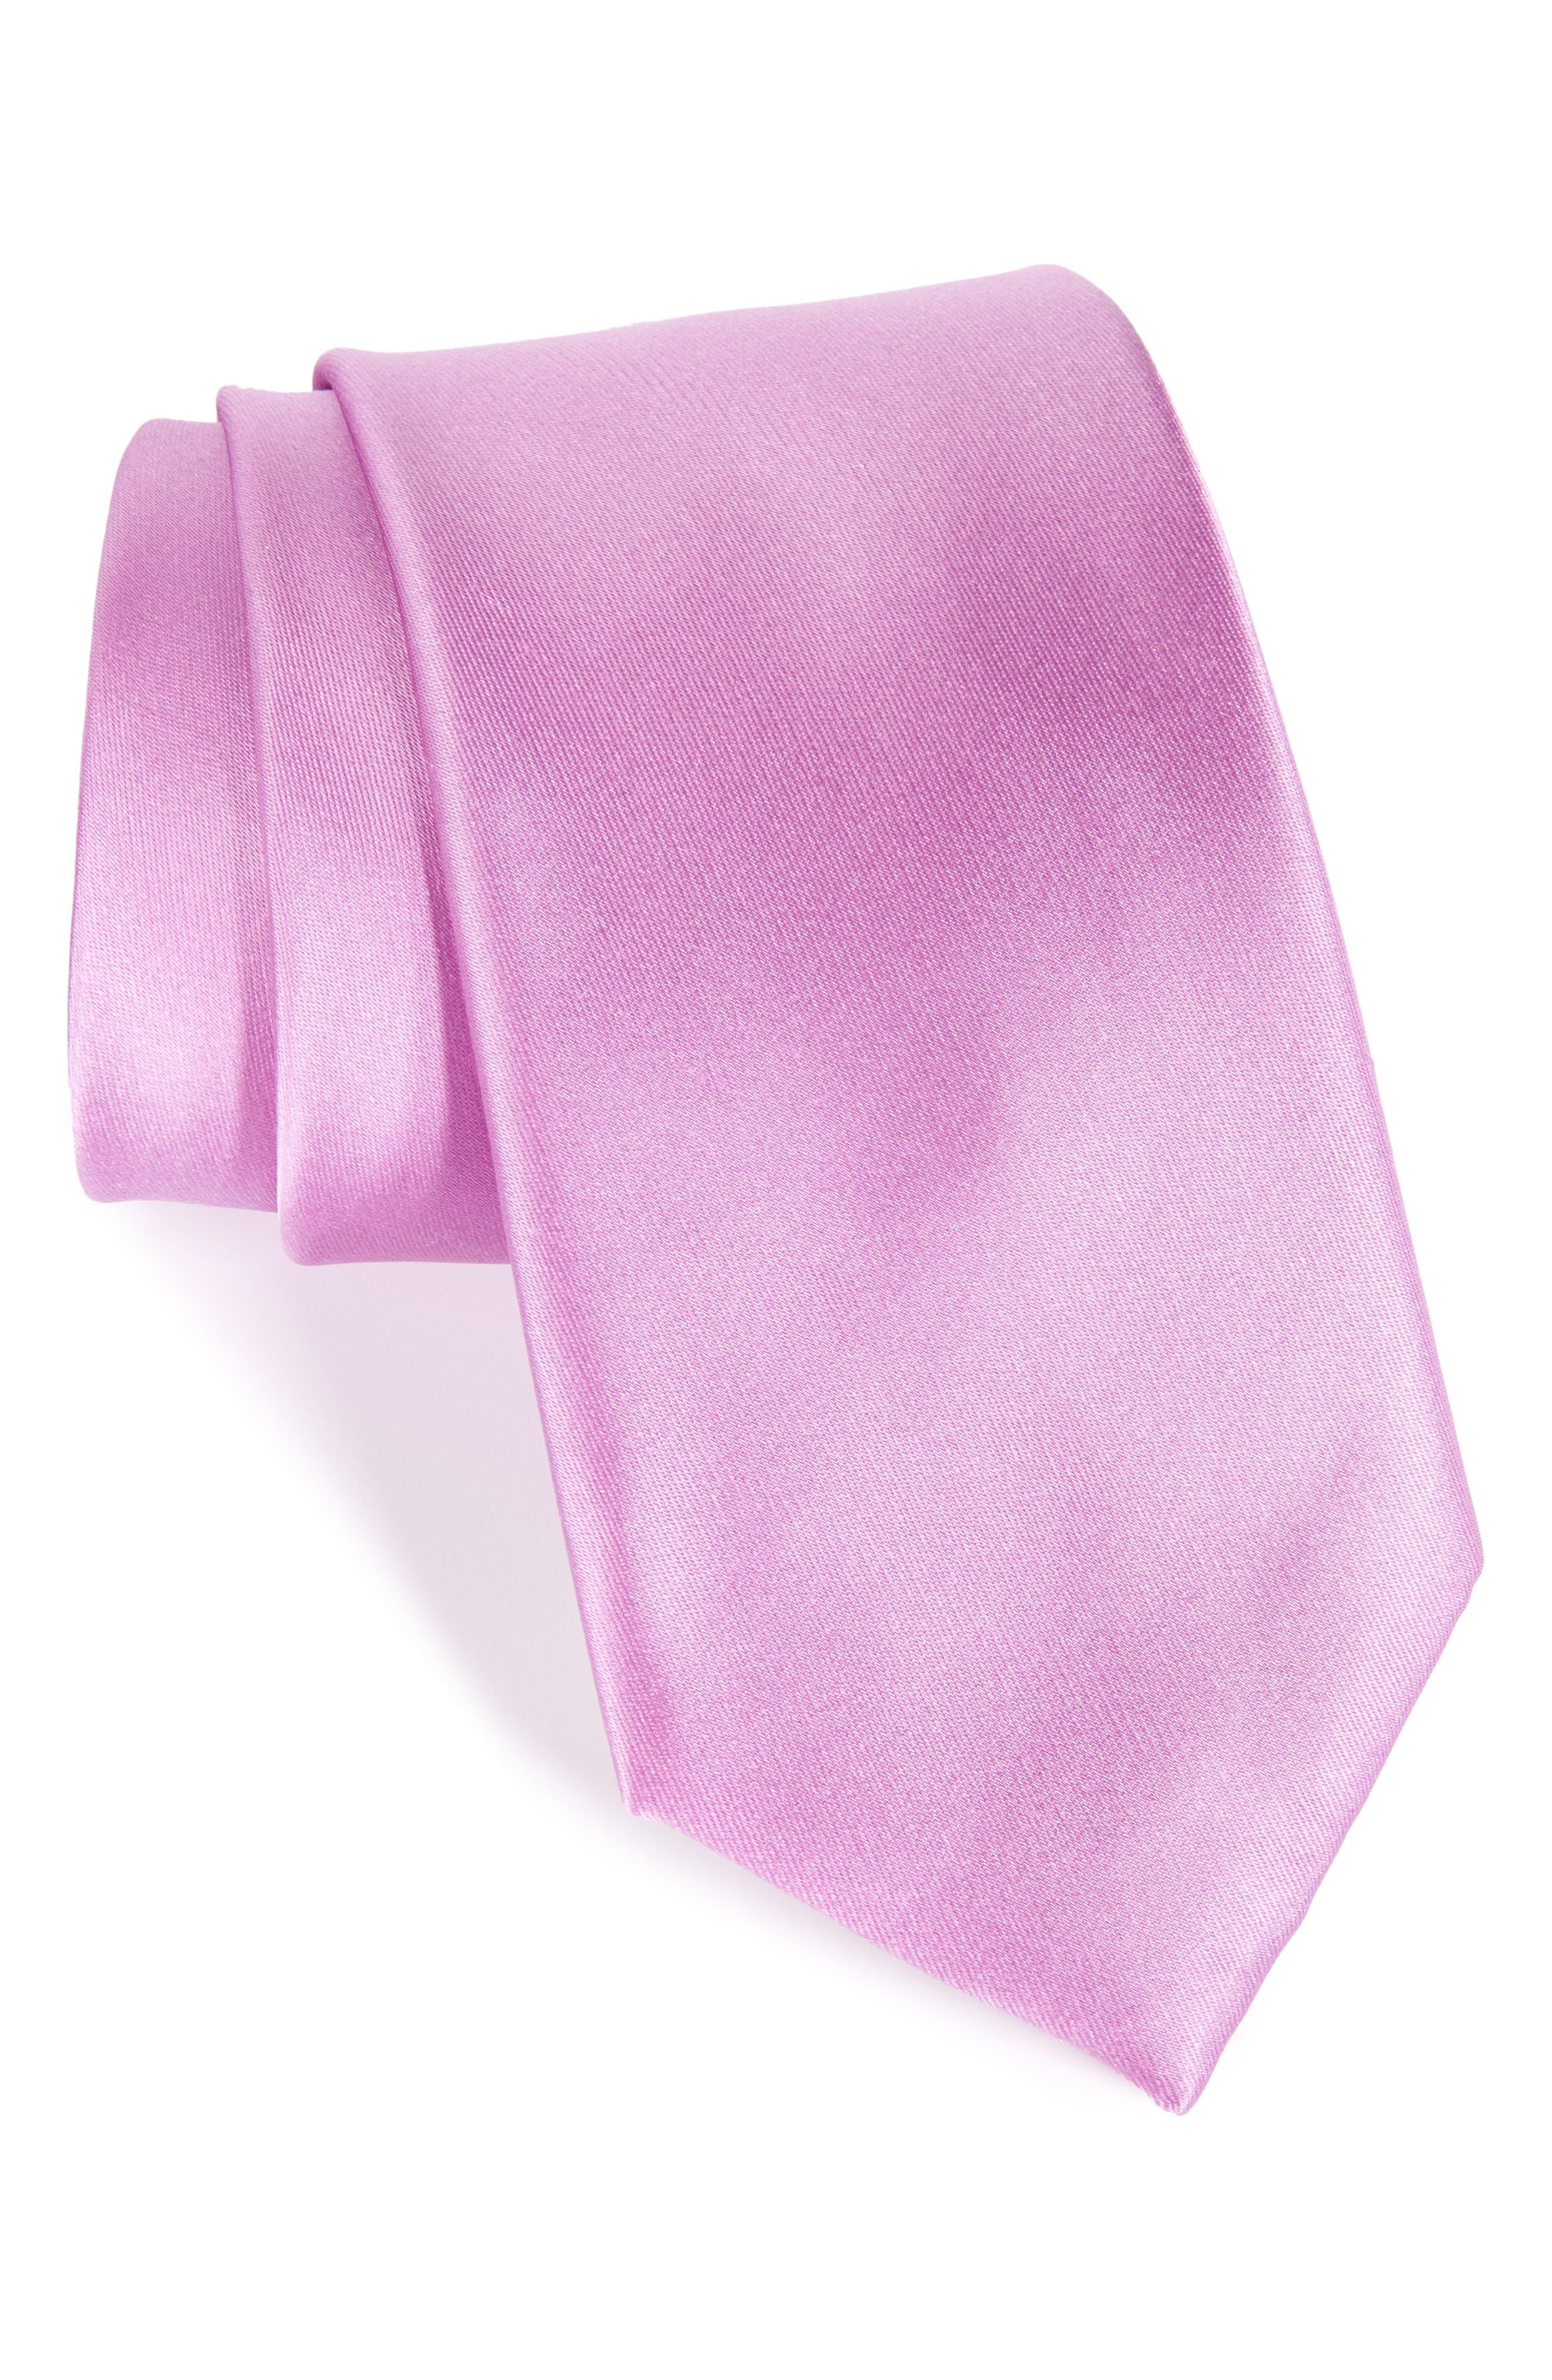 Main Image - Nordstrom Men's Shop Solid Satin Silk Tie (X-Long)